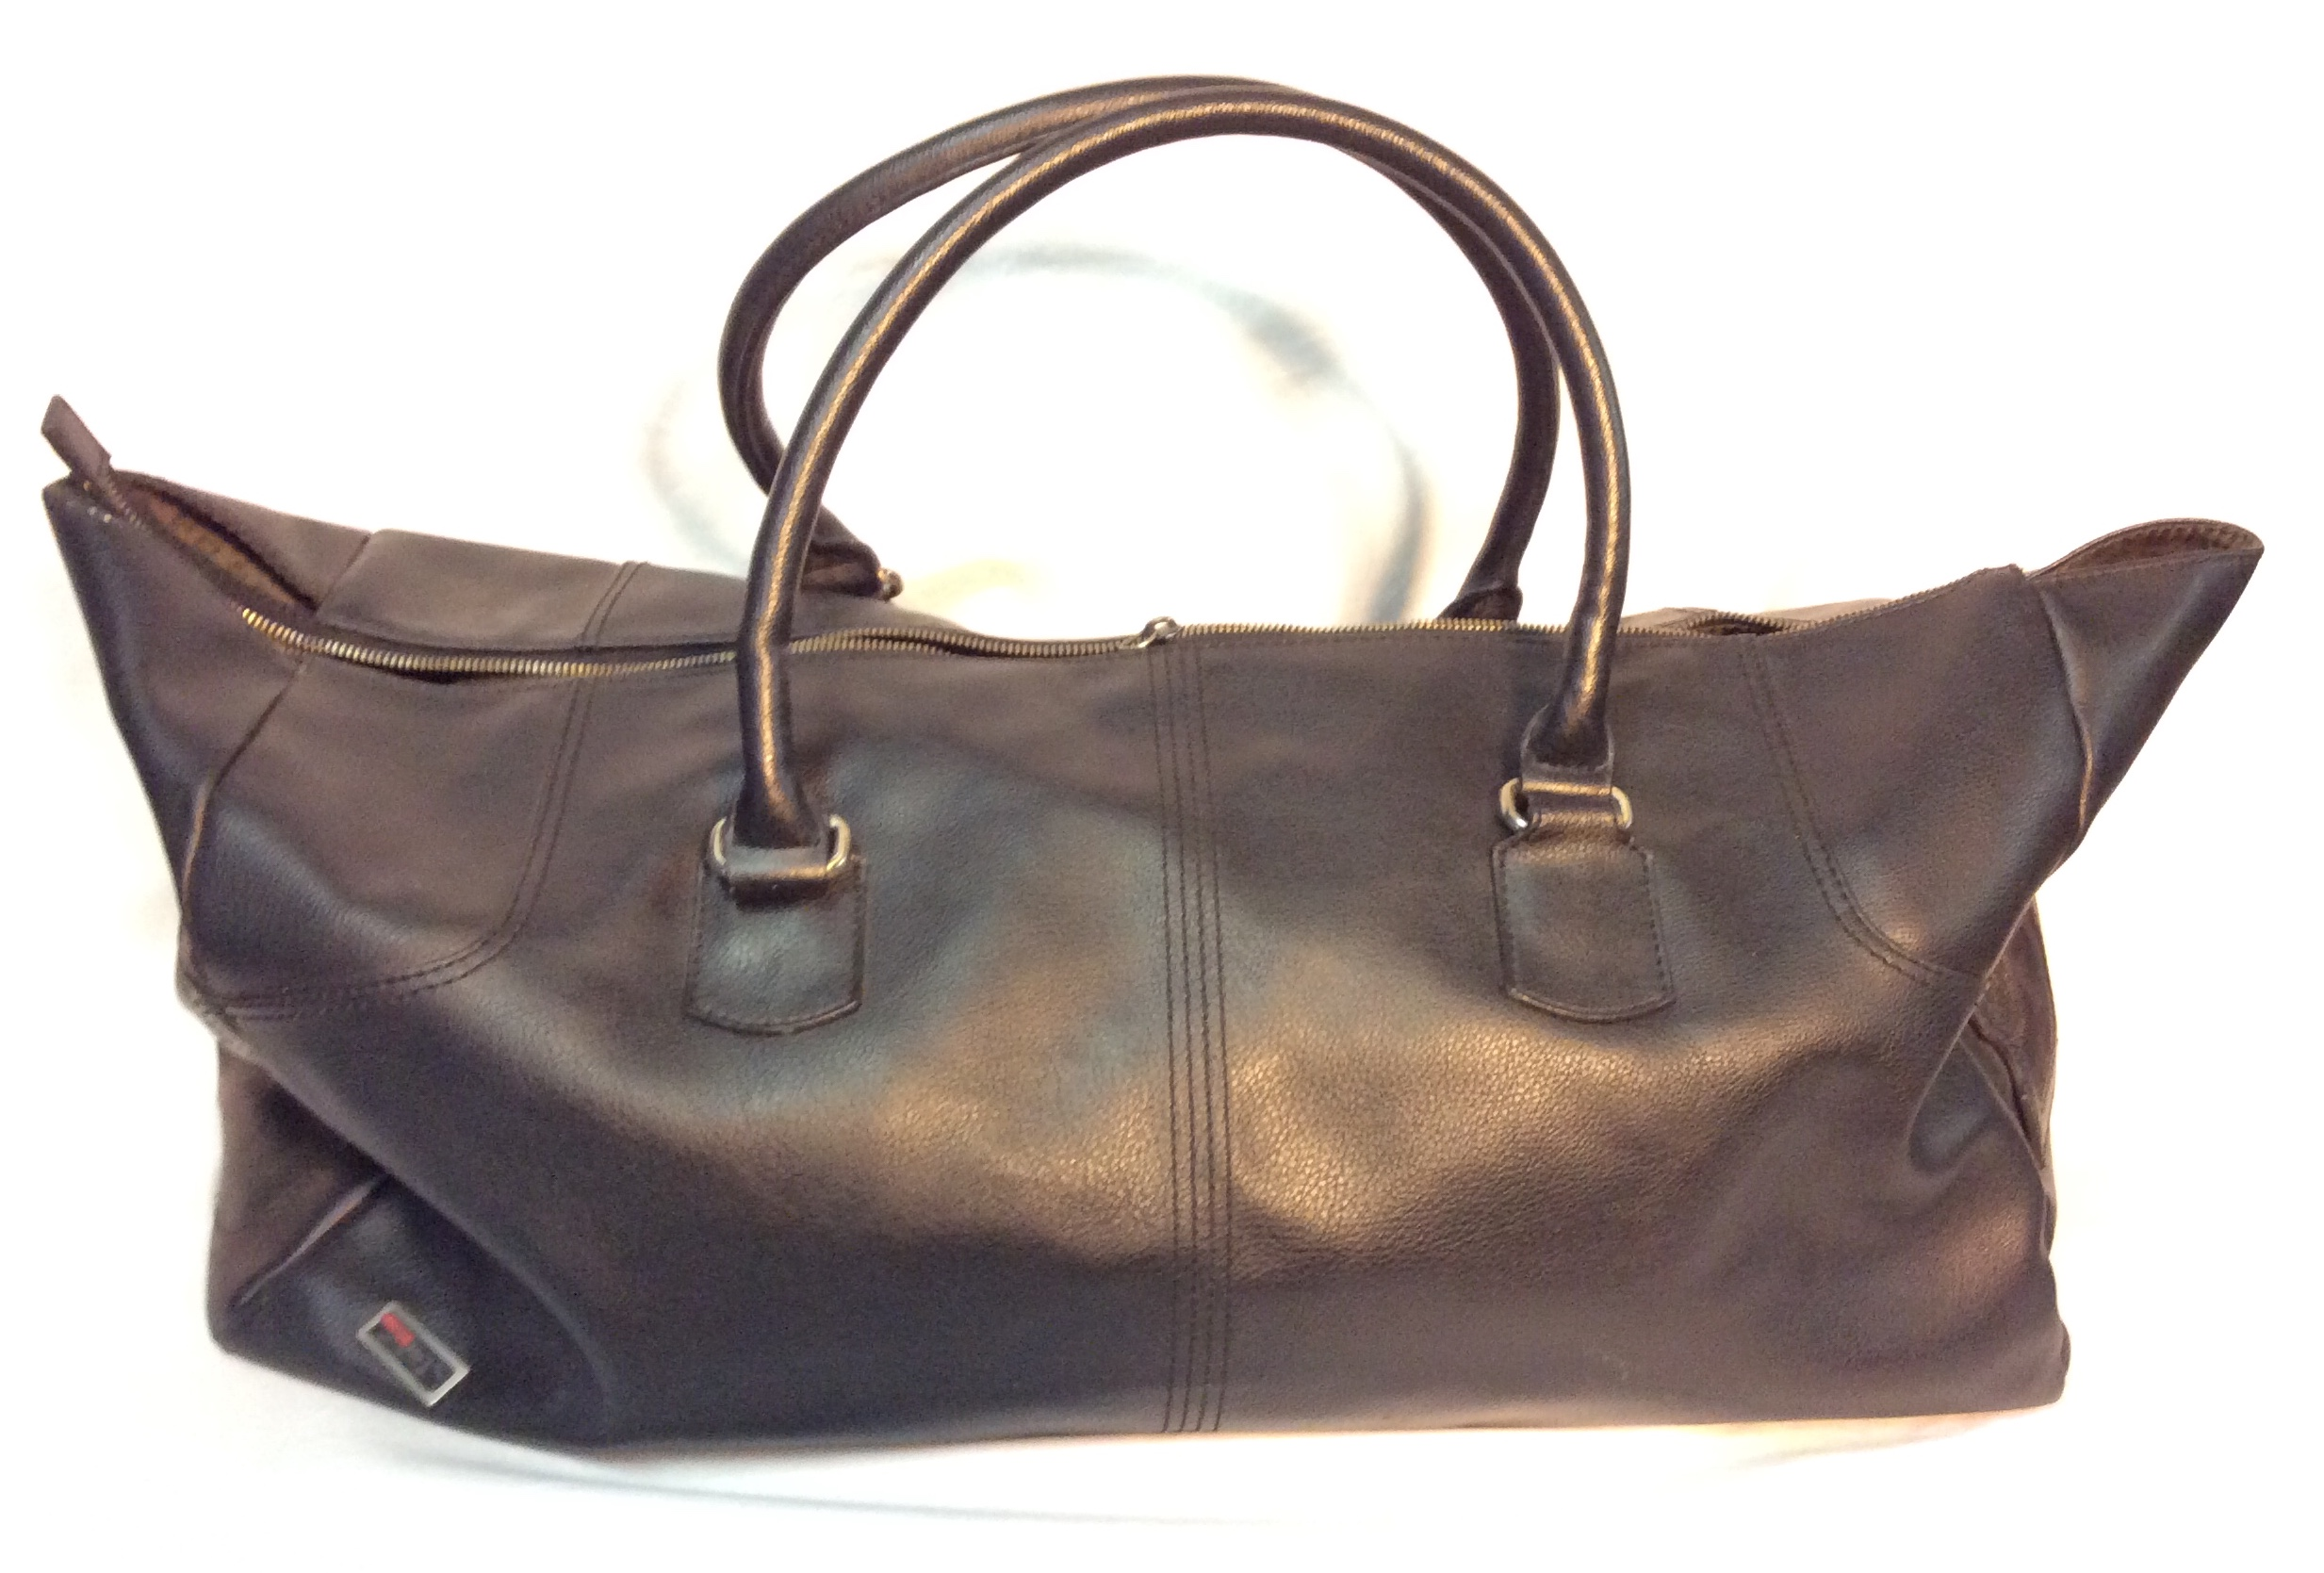 Black Mexx travel bag